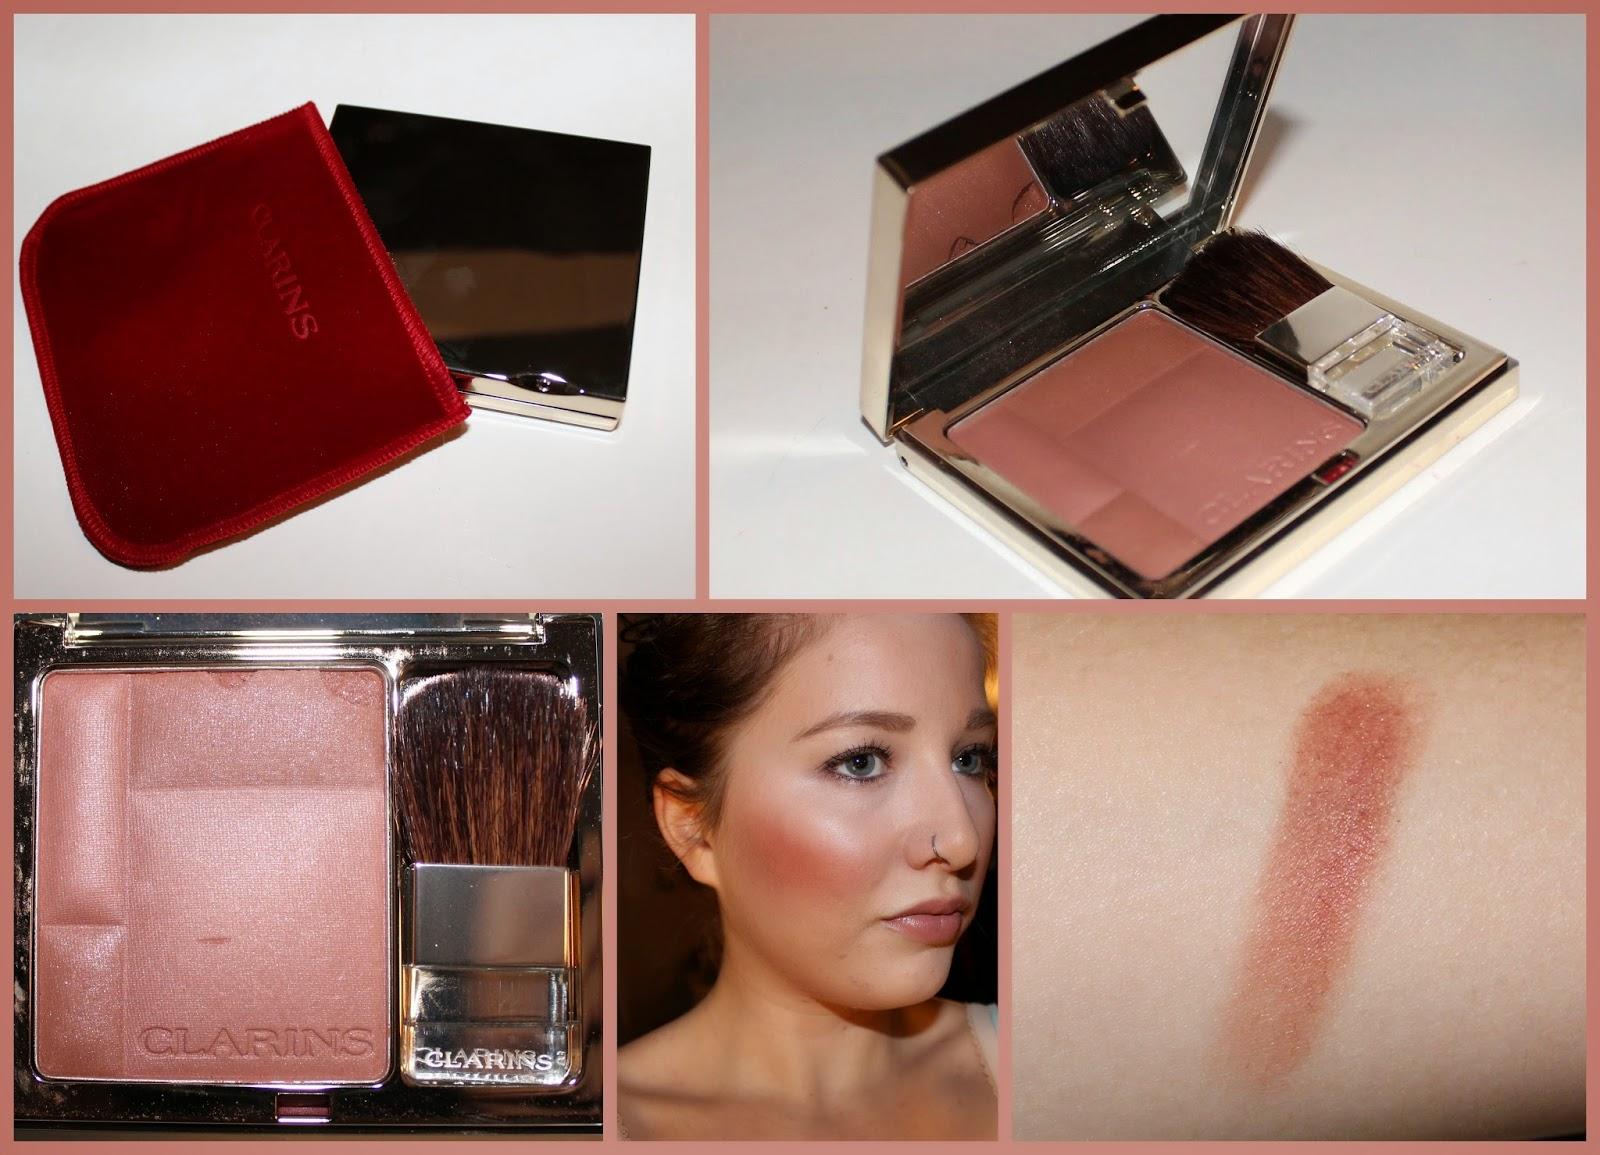 Clarins Blush Prodige in Tawny Pink